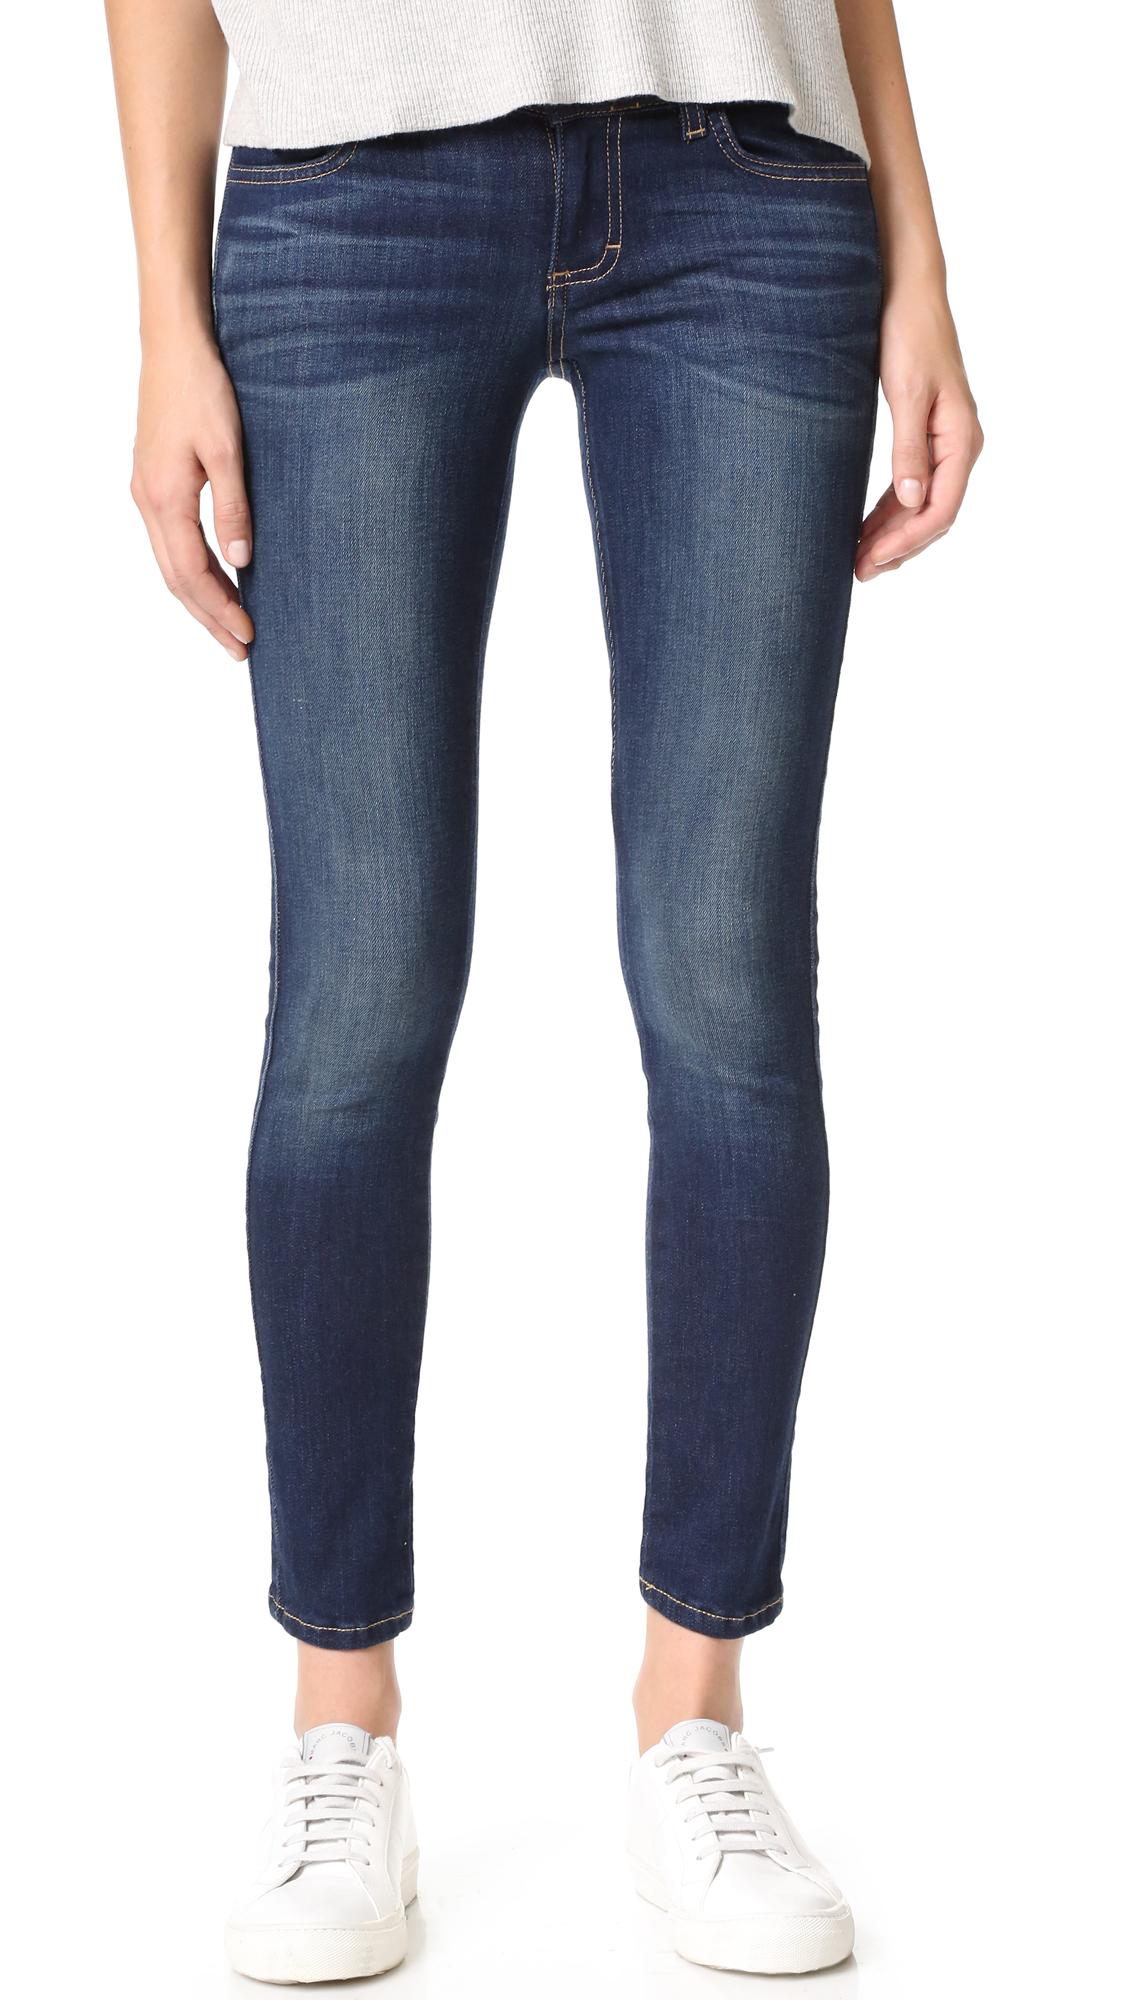 Siwy Hannah Forever Slim Jeans - Dark Blue